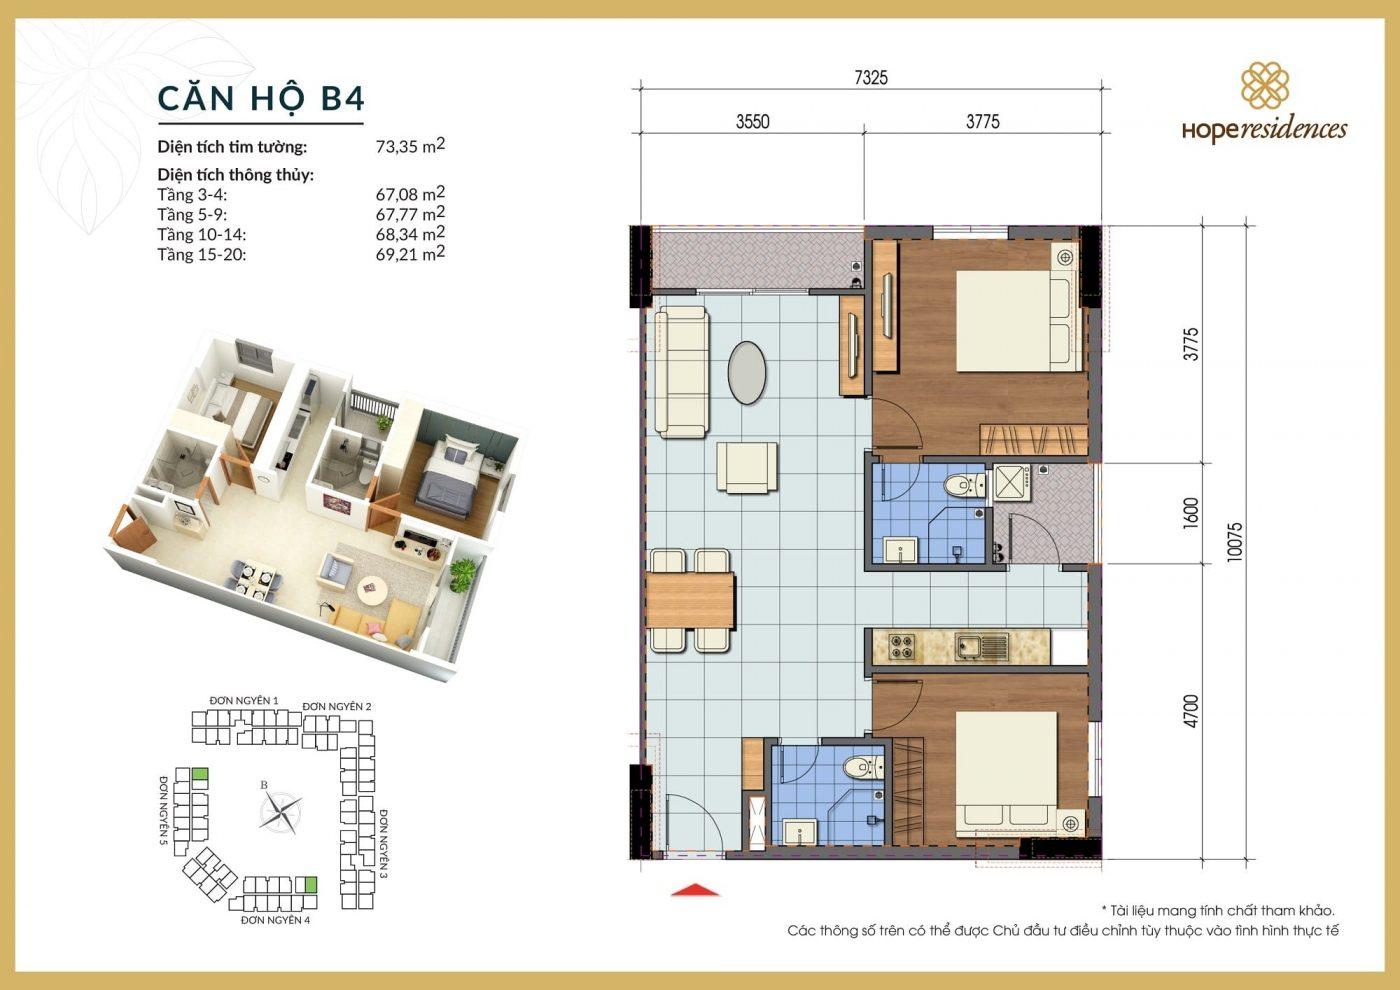 mat bang thiet ke can ho b4 hope residences